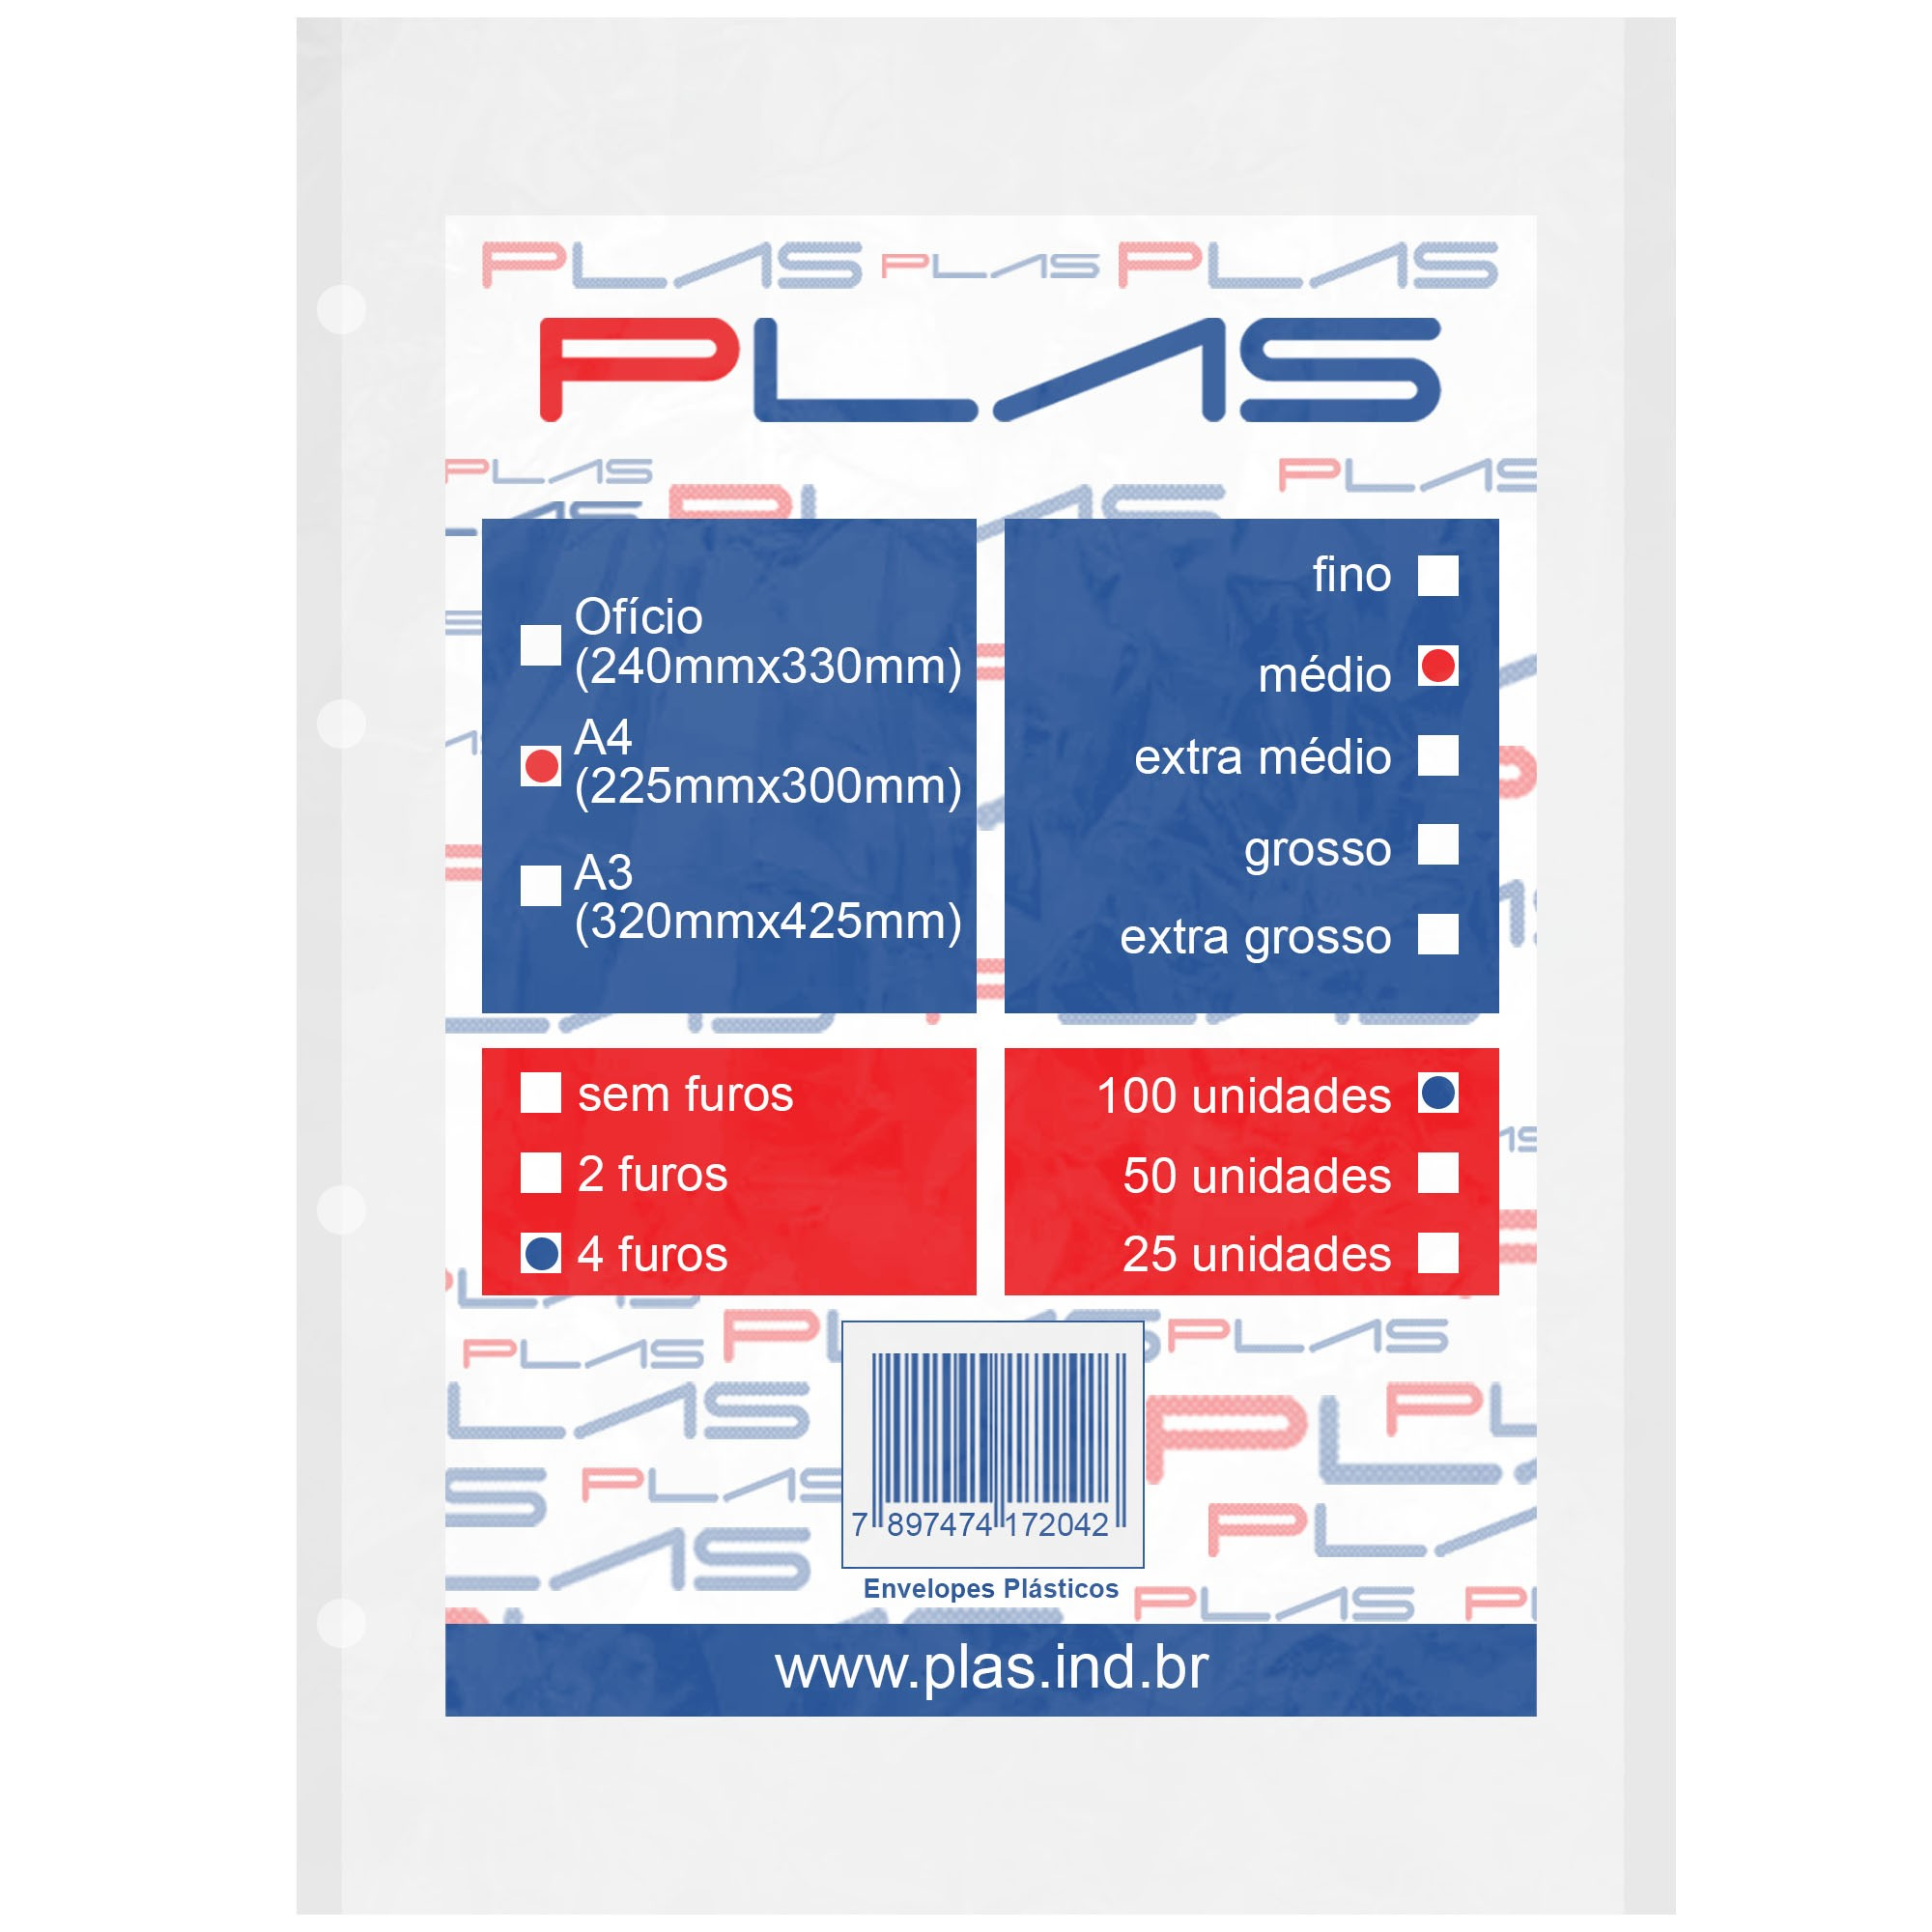 Envelope Saco Plastico tamanho A4 4 furos Medio pct c/ 100 un - Iplas